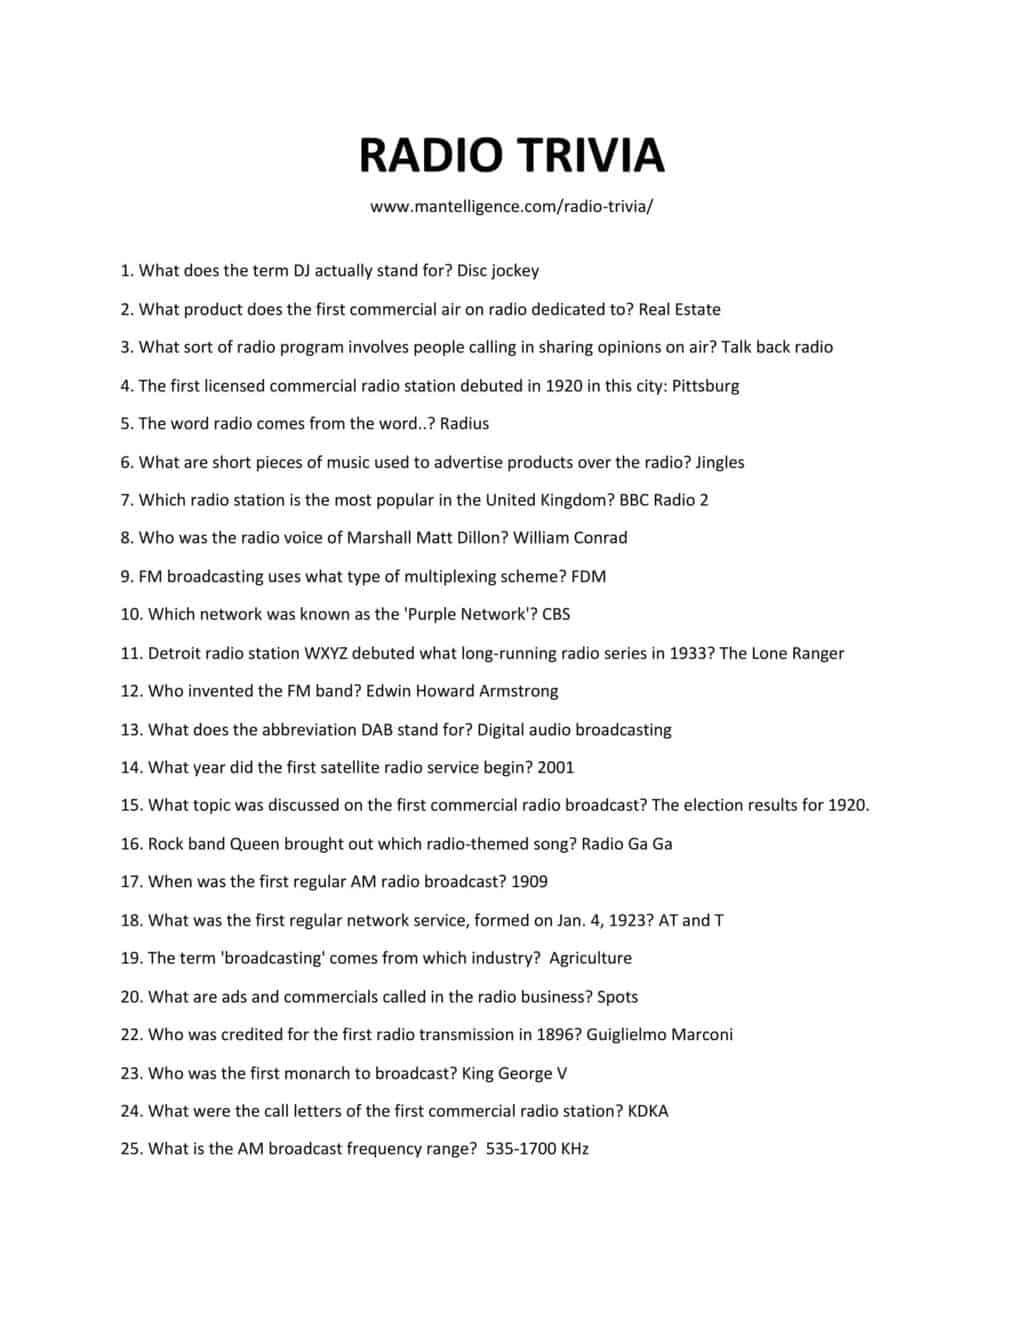 Downloadable list of trivia as jpg or pdf